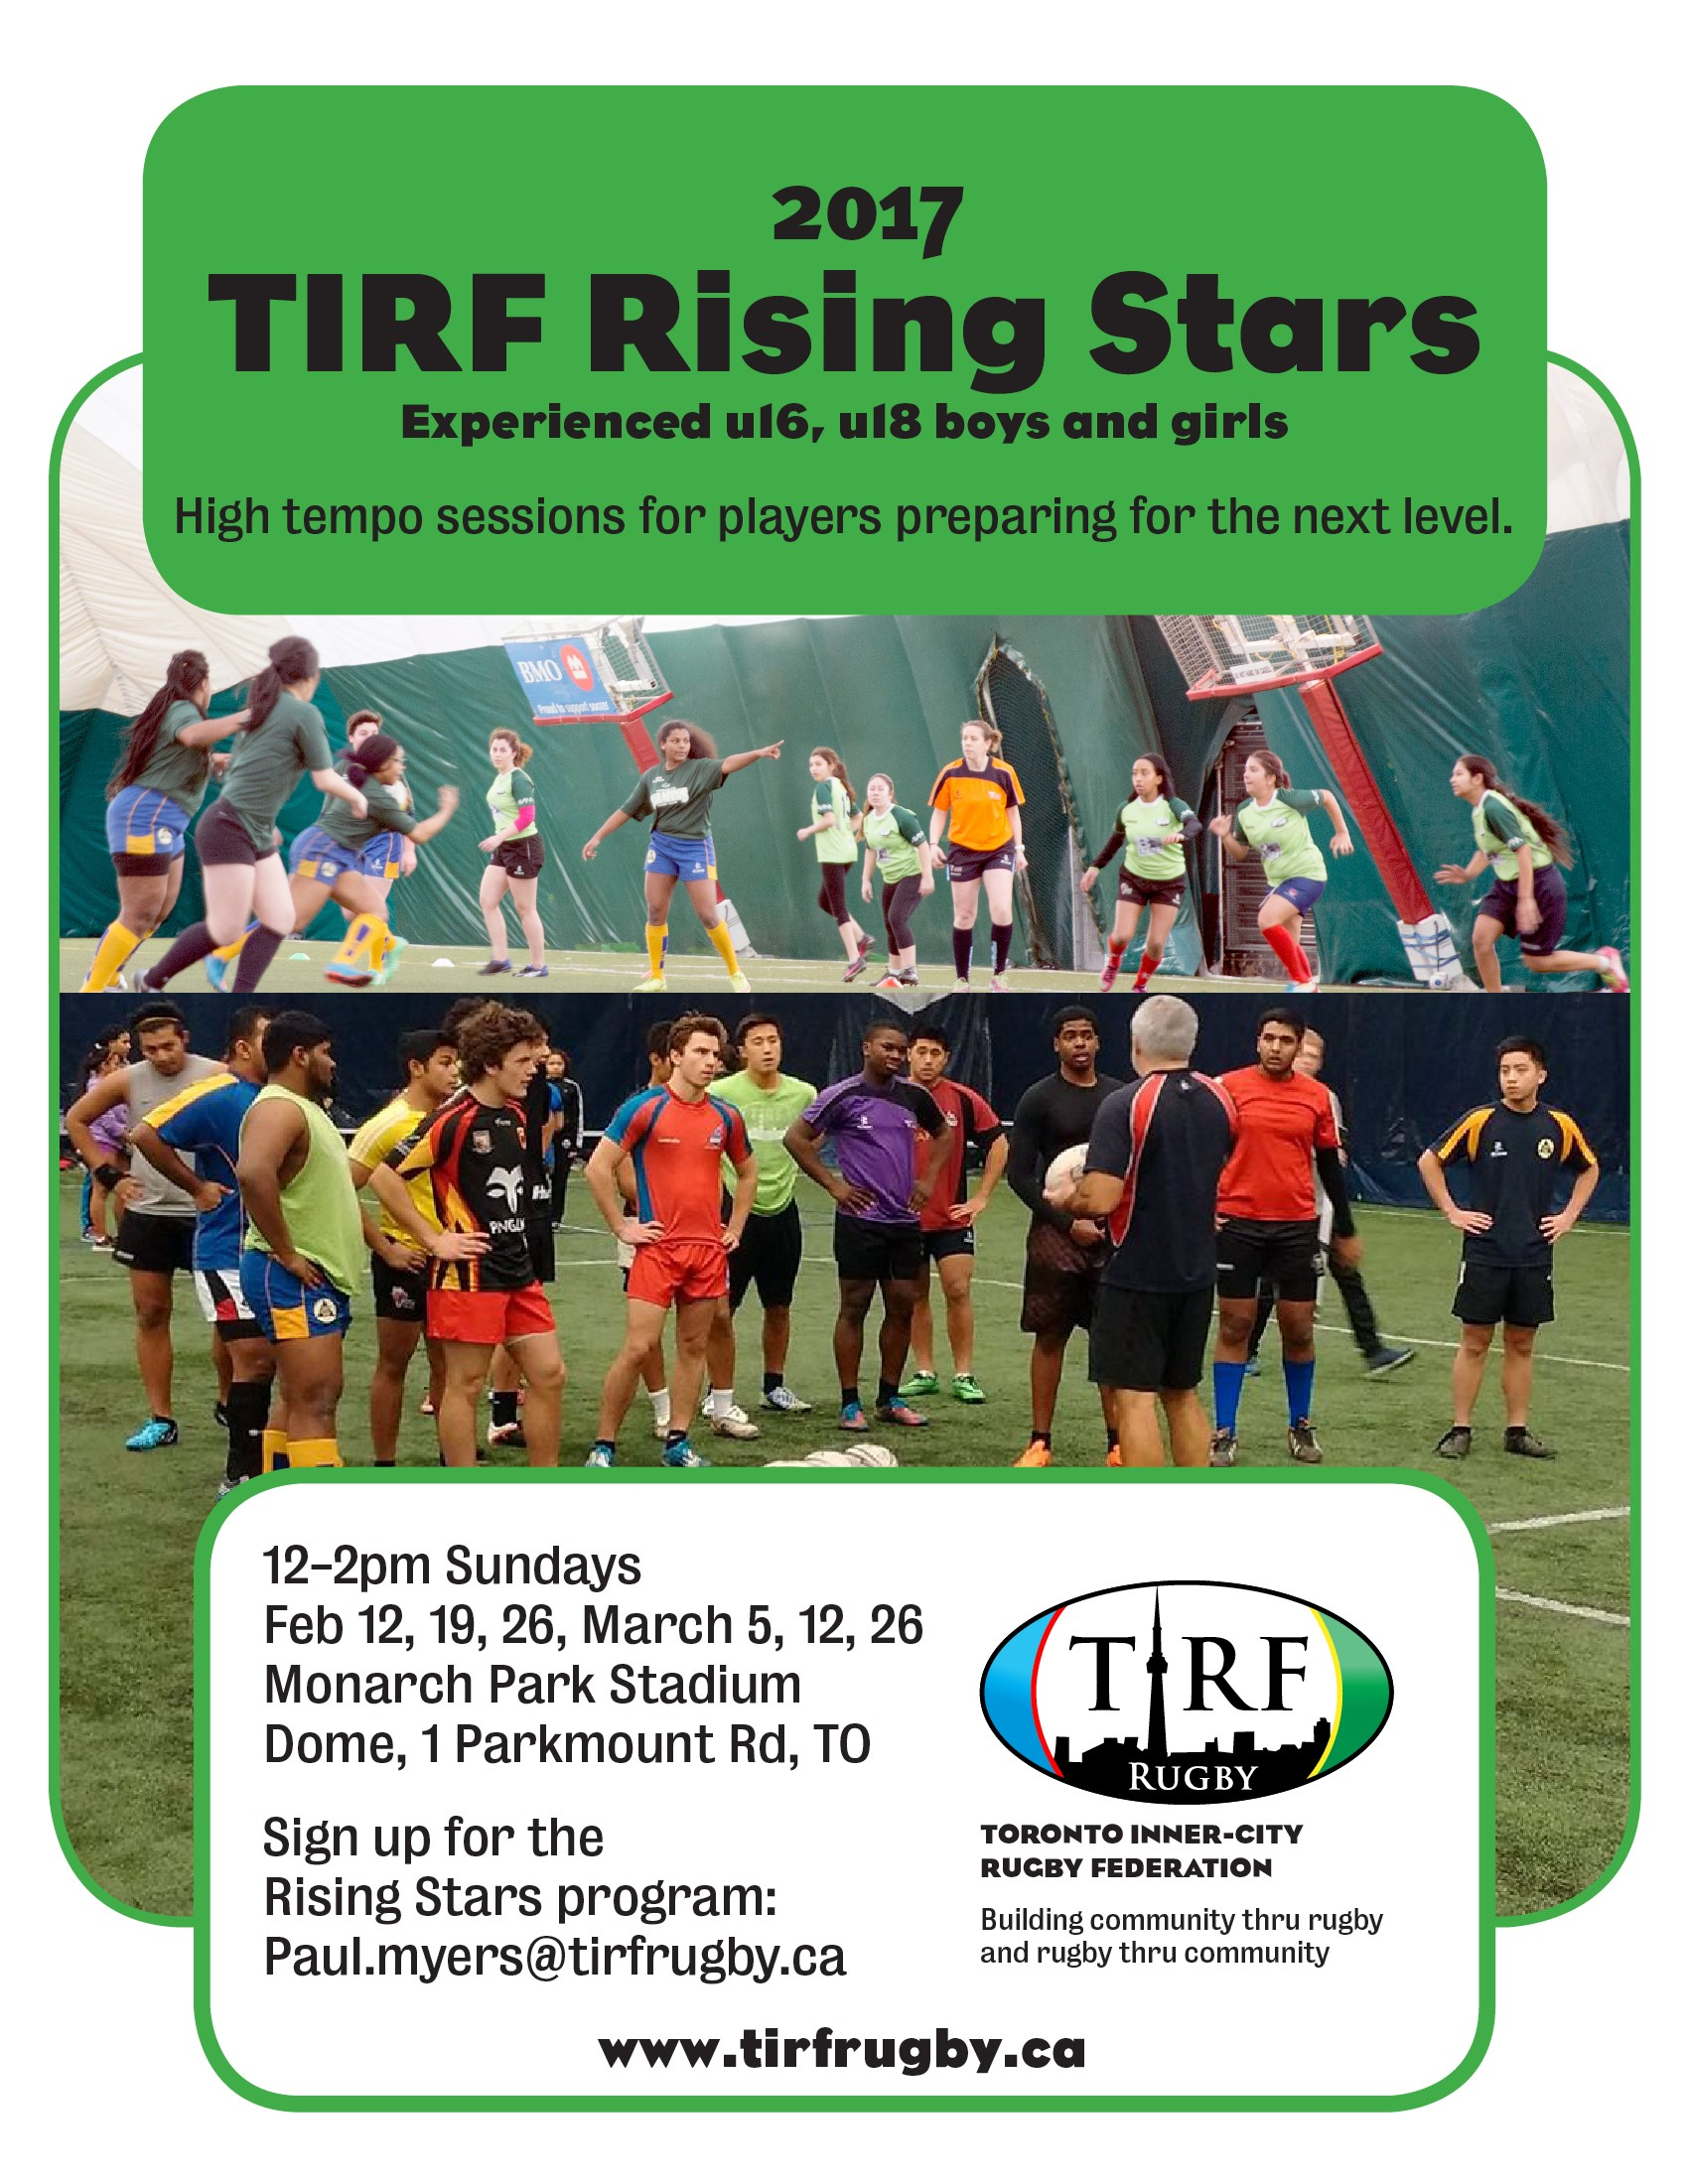 2017 TIRF Rising Stars Training Schedule